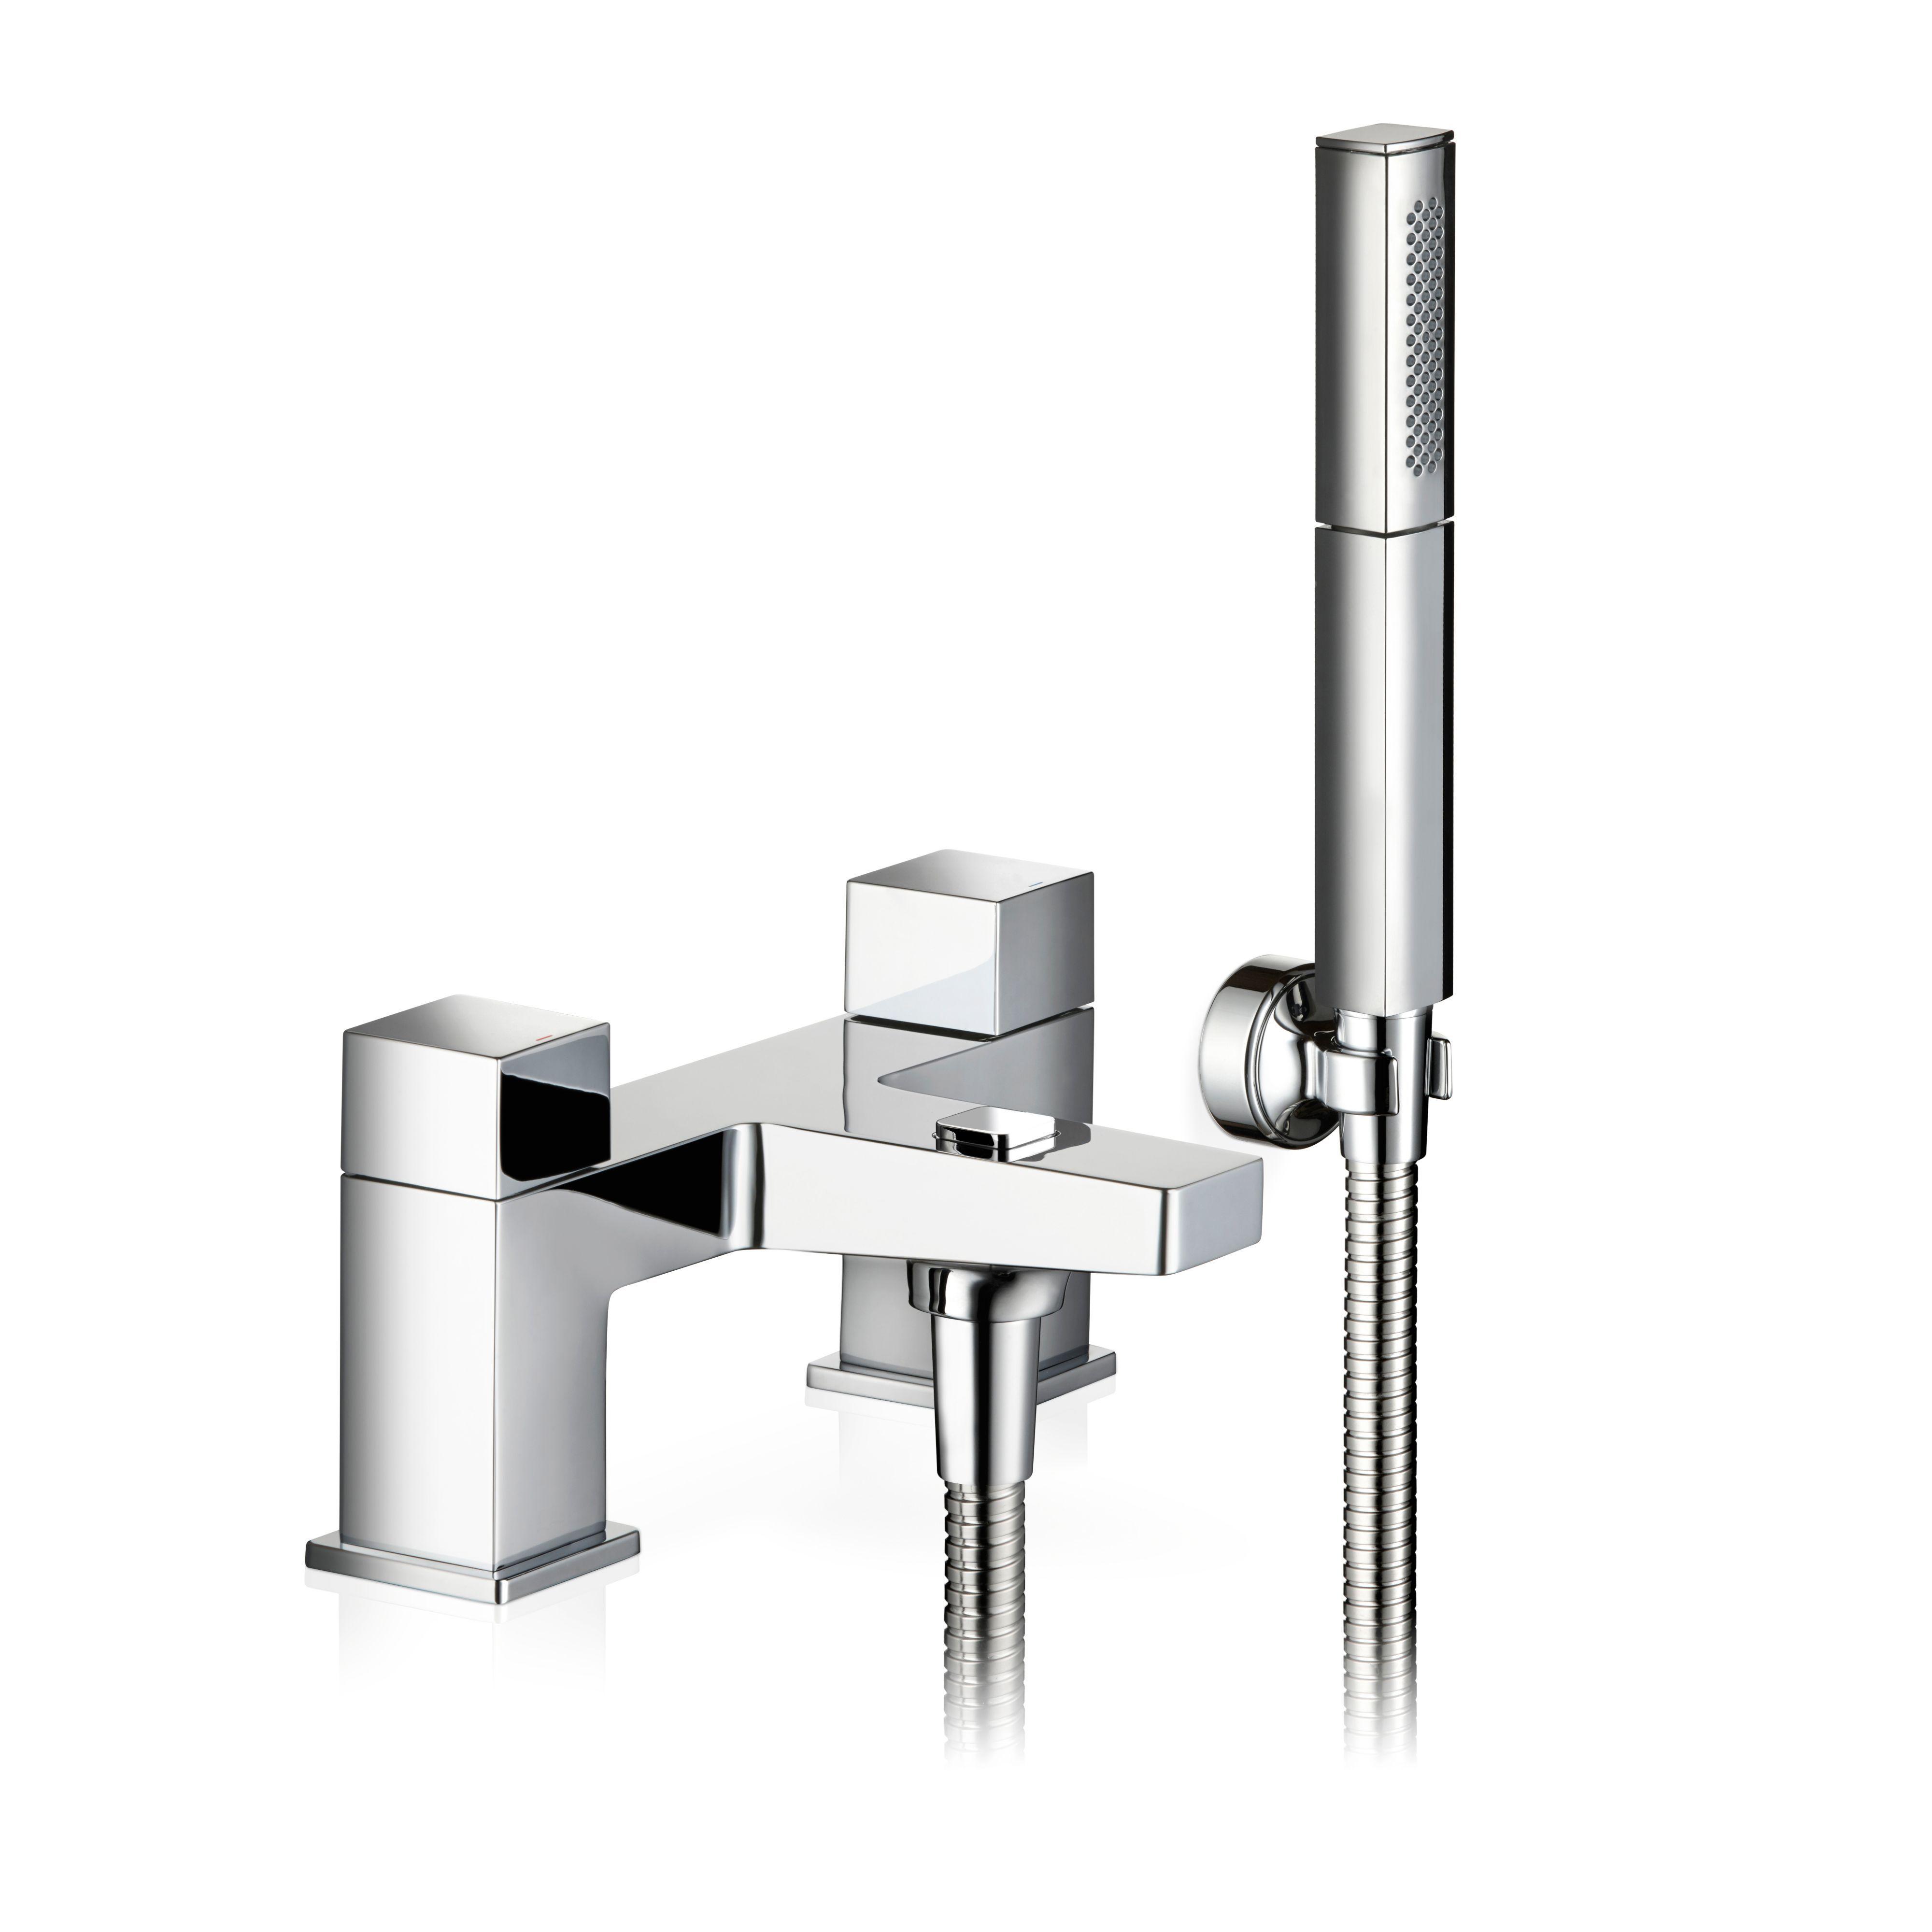 mira honesty chrome bath shower mixer tap departments diy at b q